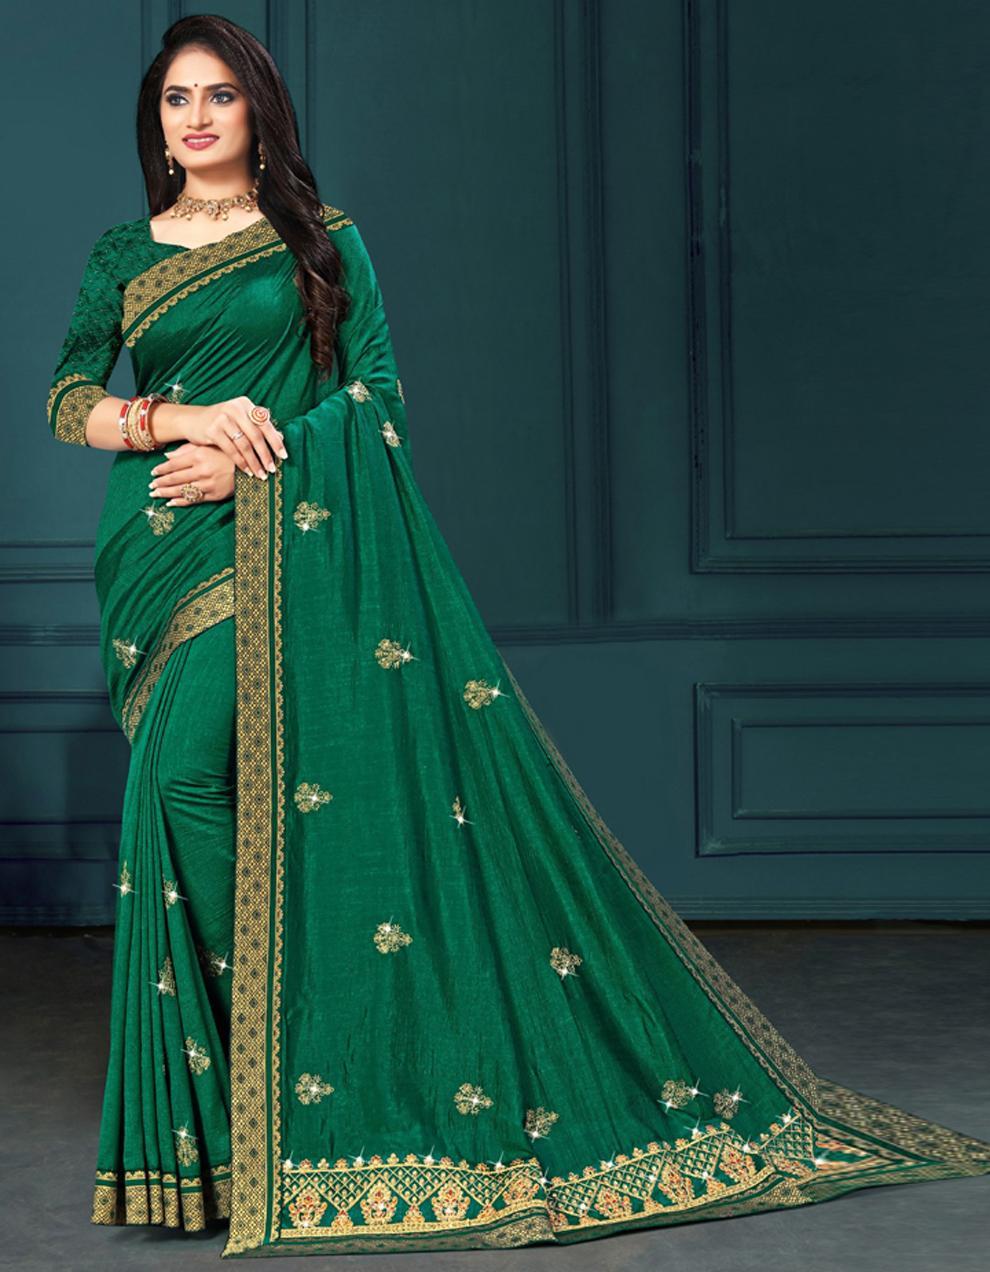 Green Vichitra silk Saree With Blouse IW24272